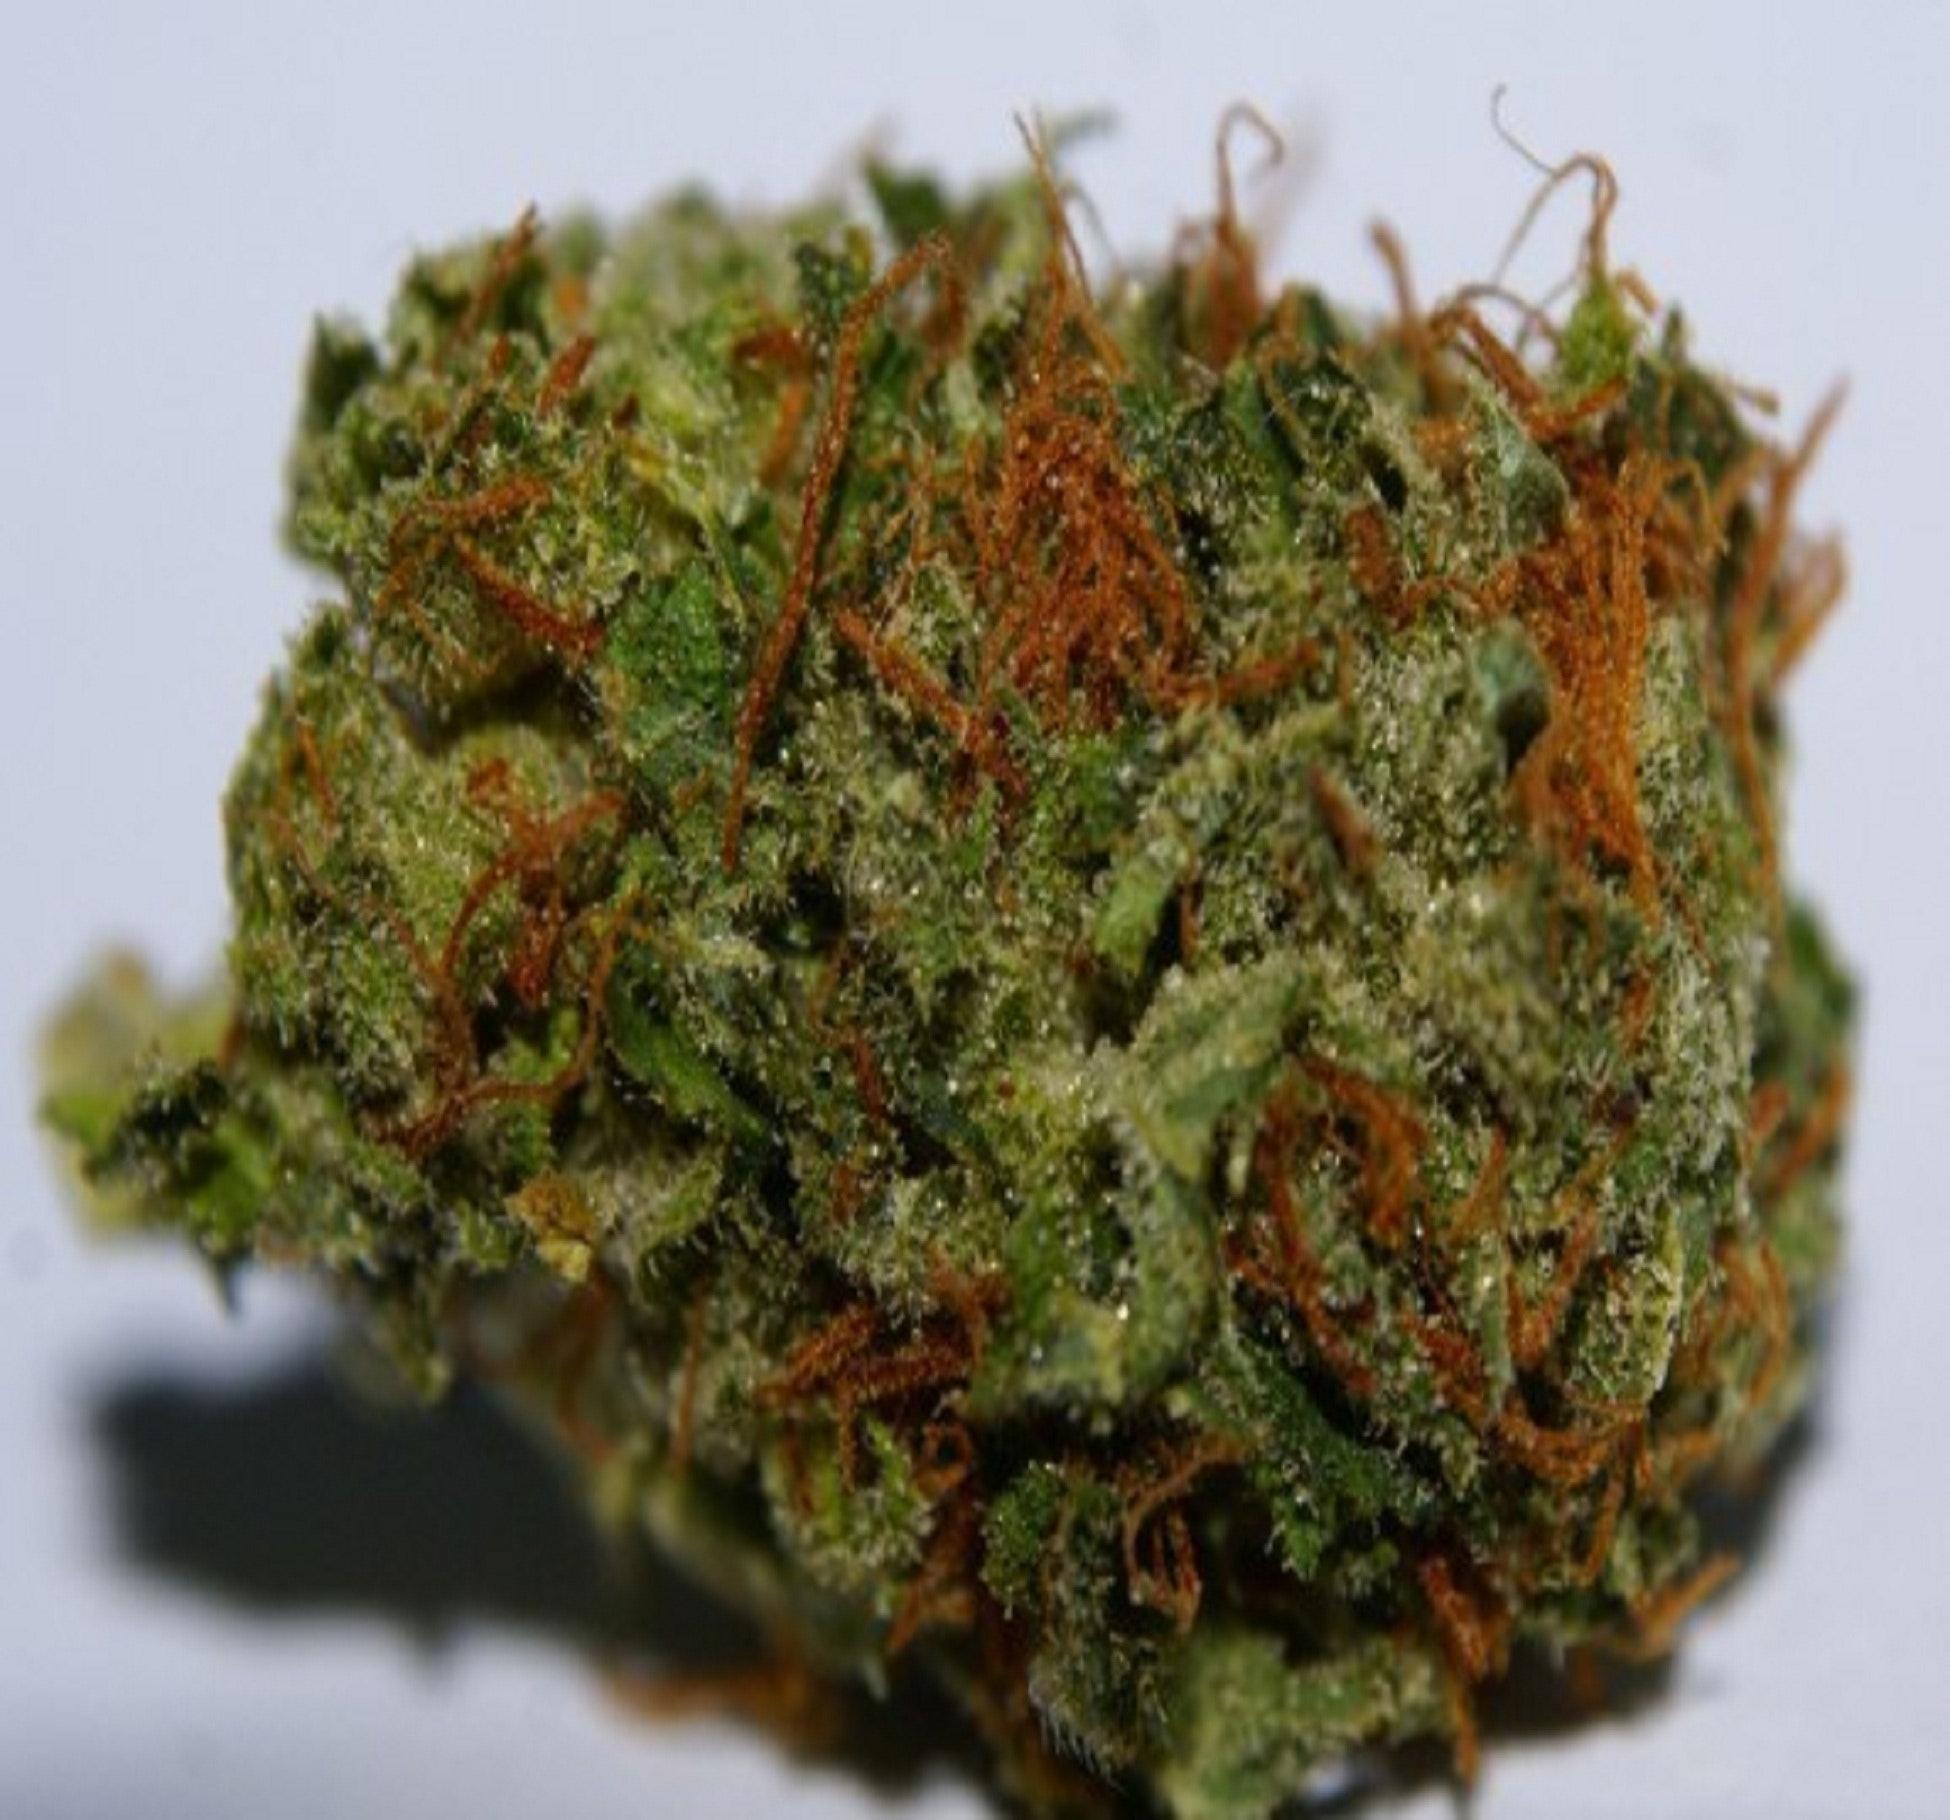 Free stock photo of buy marijuana online, buy marijuana online canada